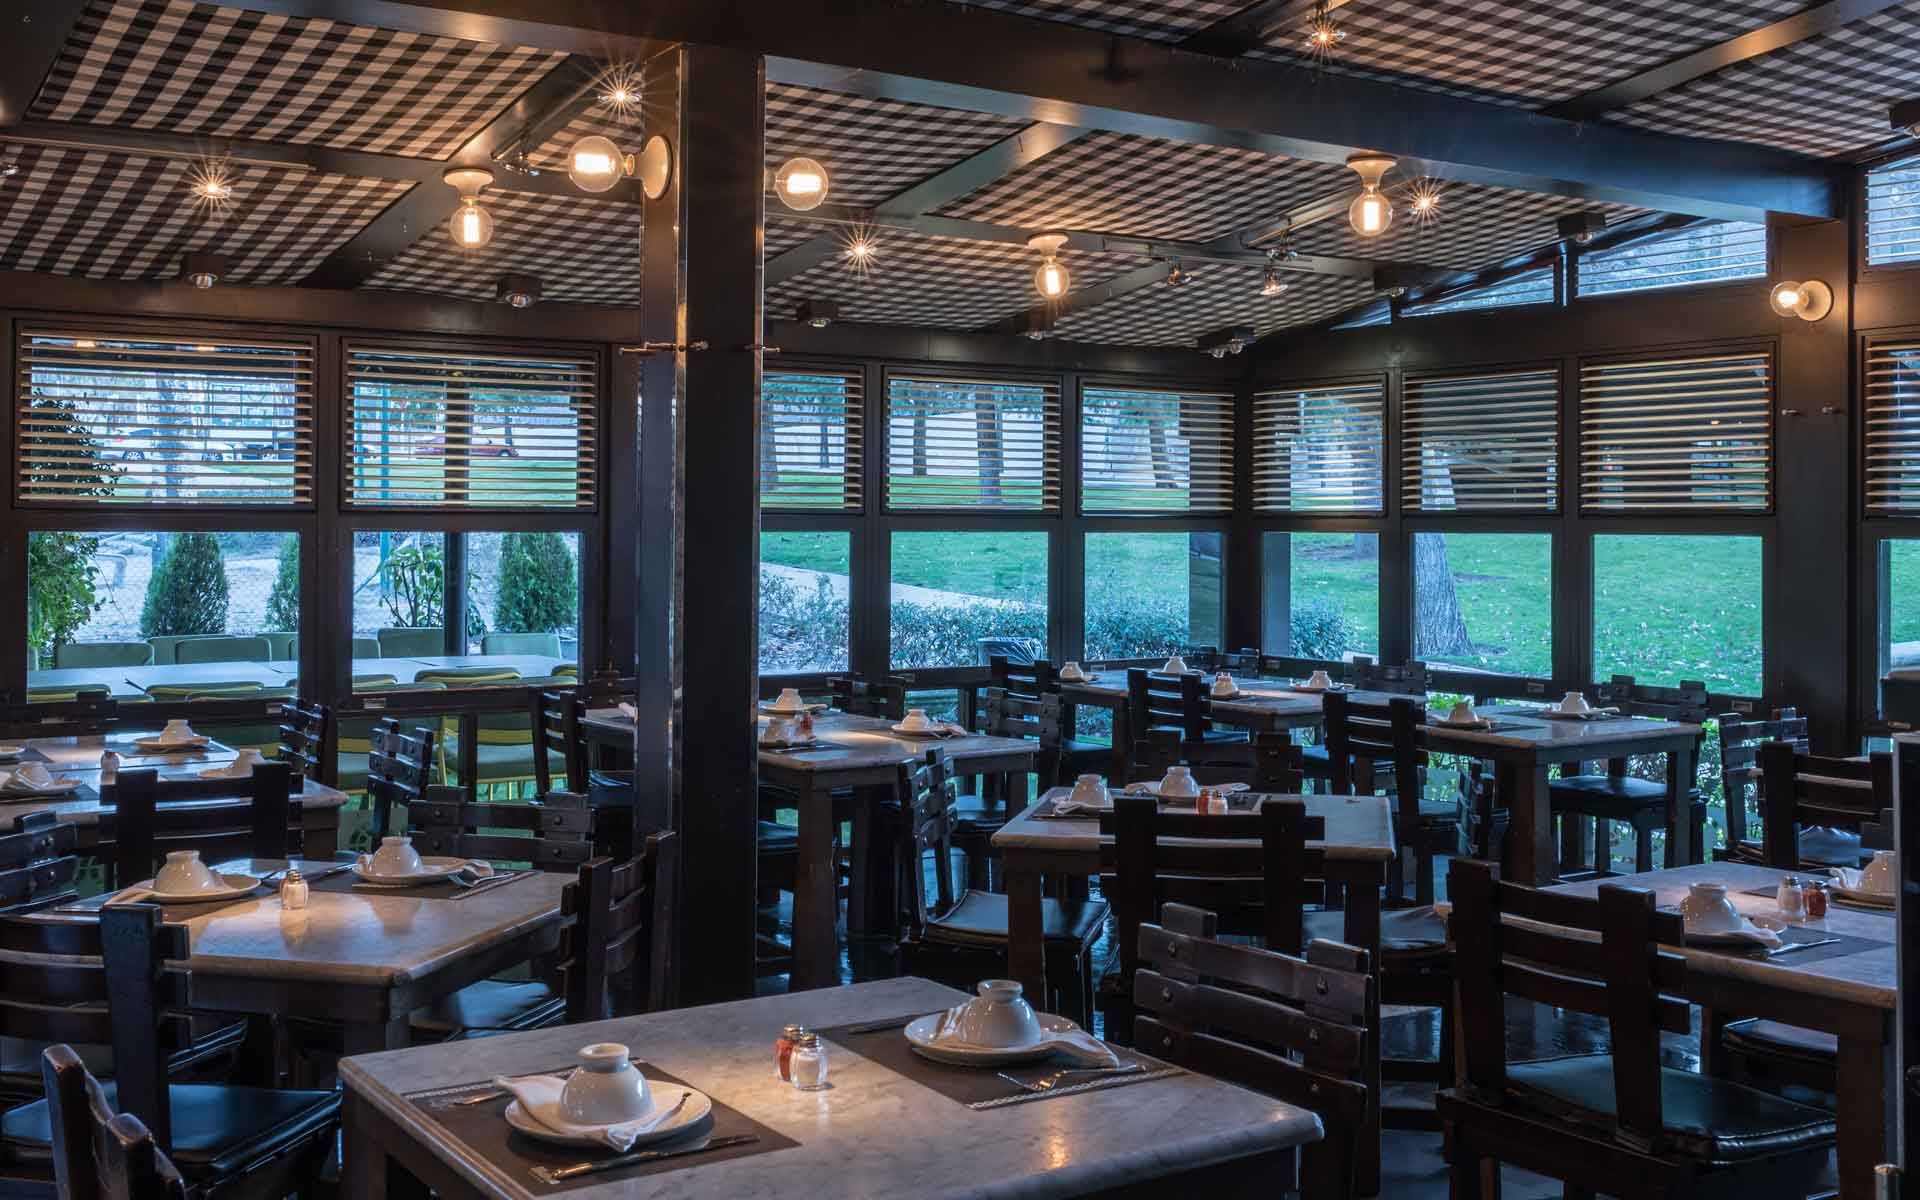 La Gran Pulperia de Pozuelo restaurant